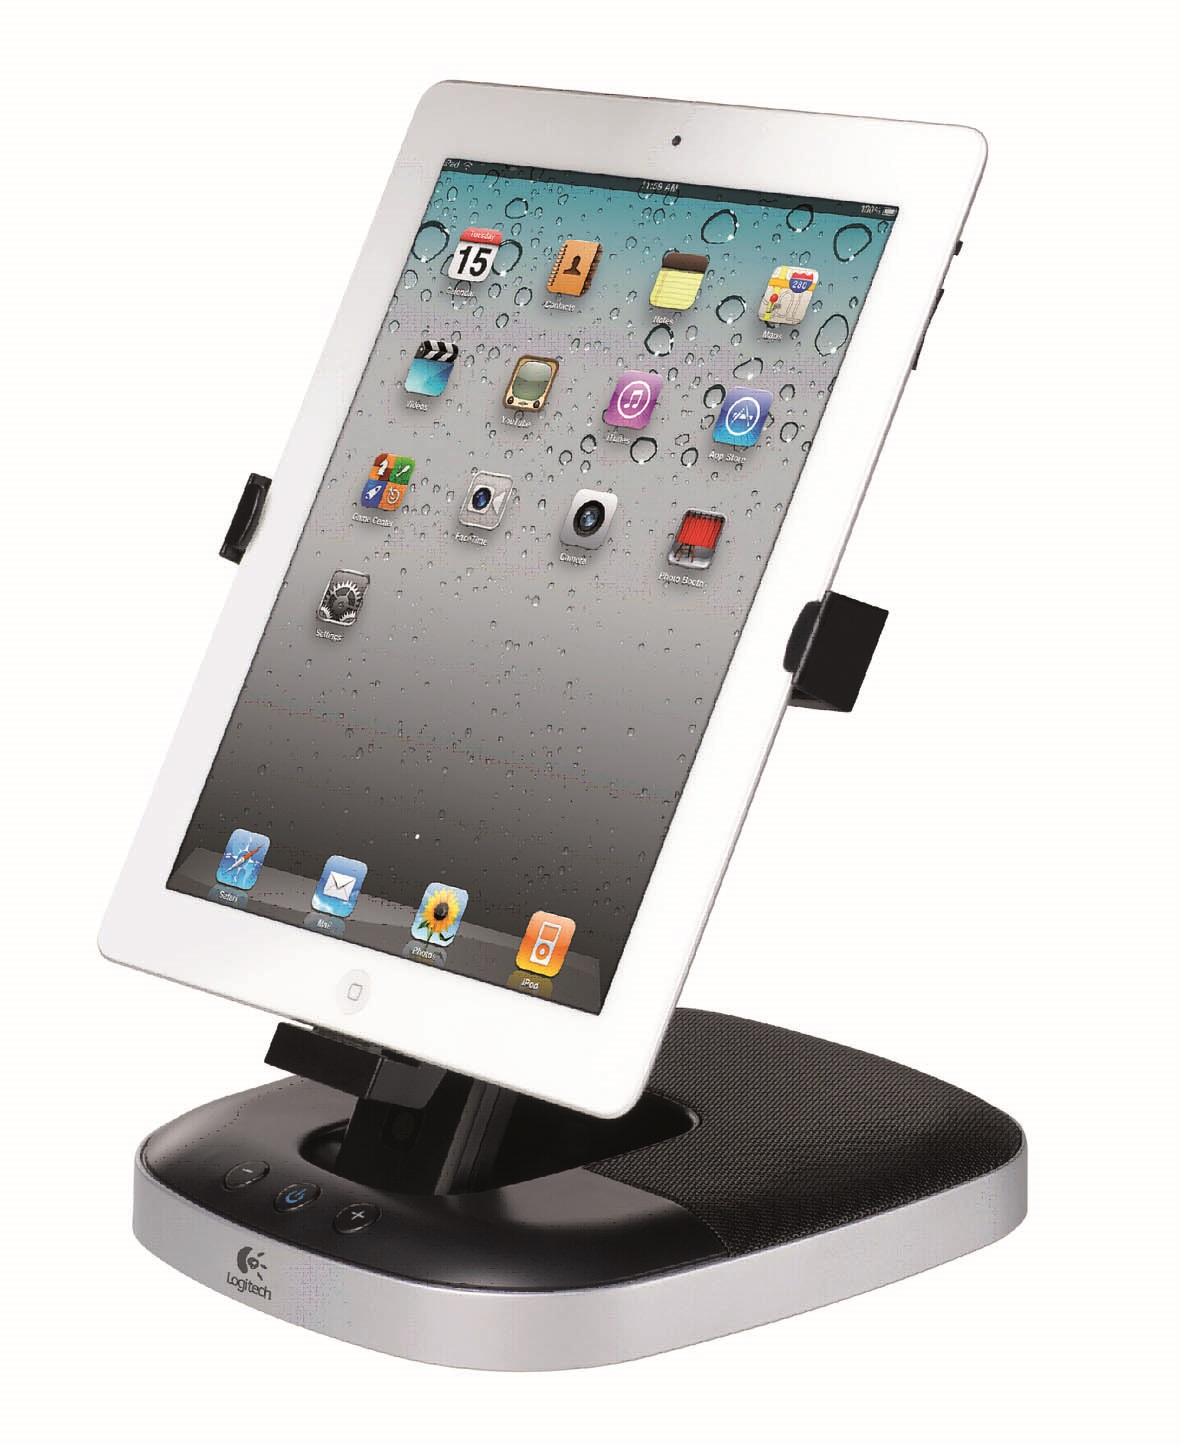 Logitech Speaker Stand Dock Amp Charge For Apple Ipad Ipad 2